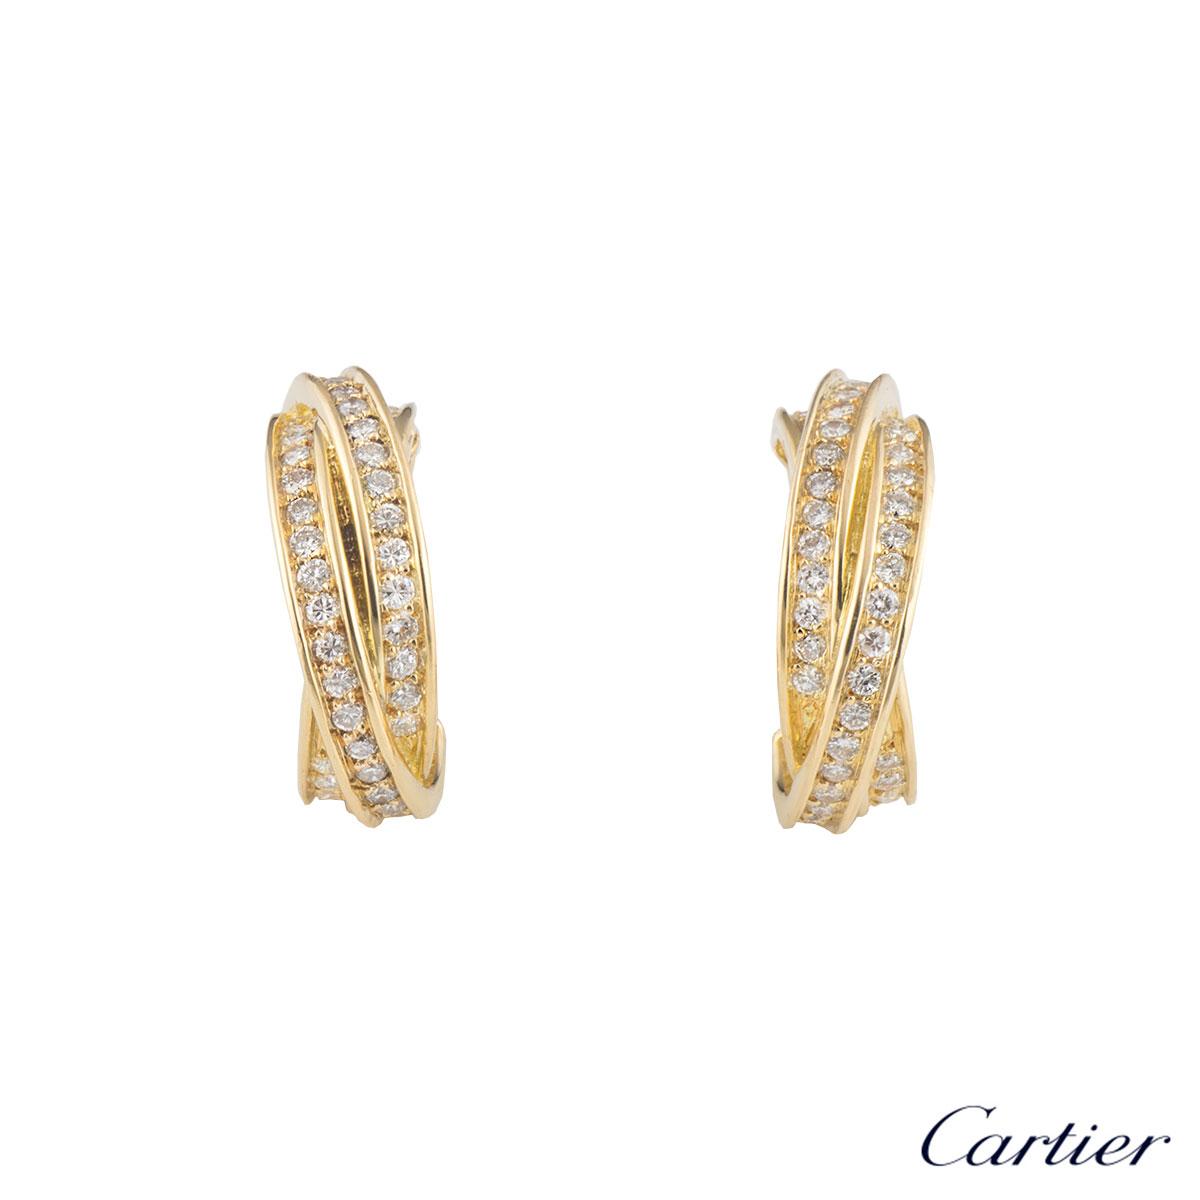 Cartier Yellow Gold Diamond Trinity Earrings